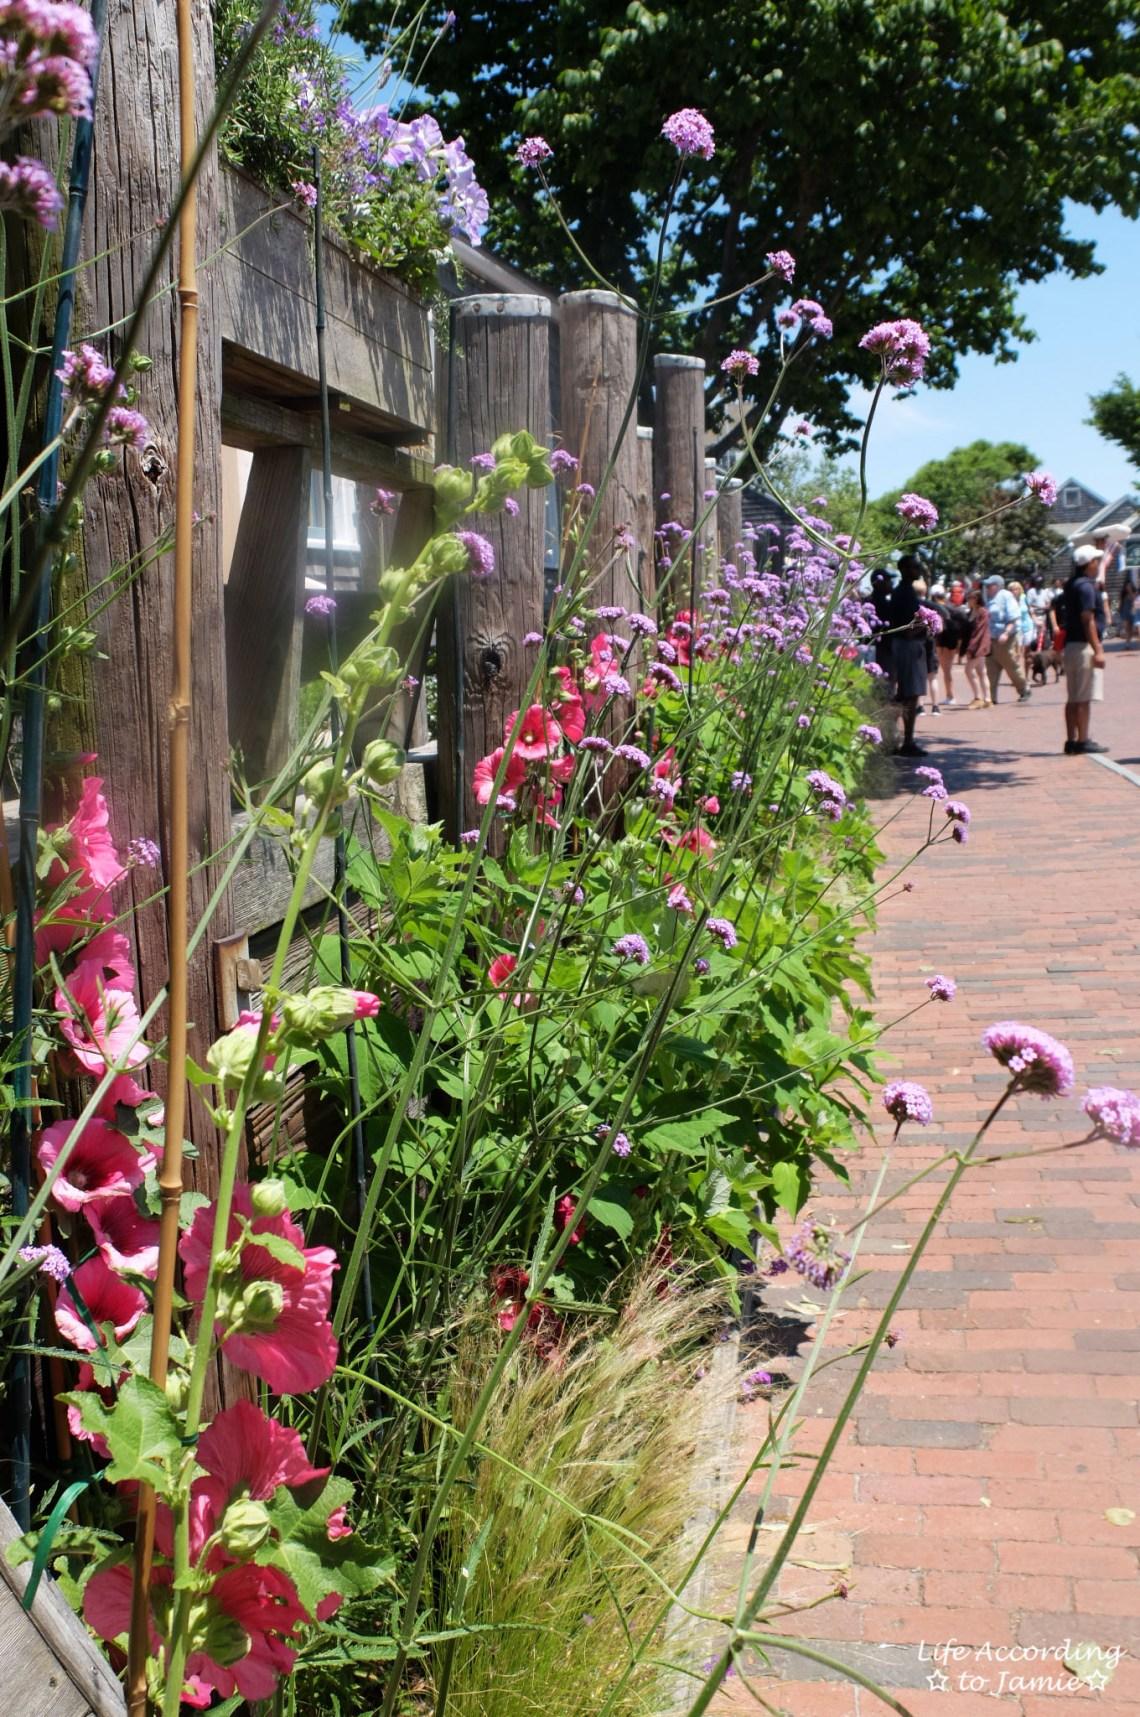 Nantucket - Sidewalk flowers